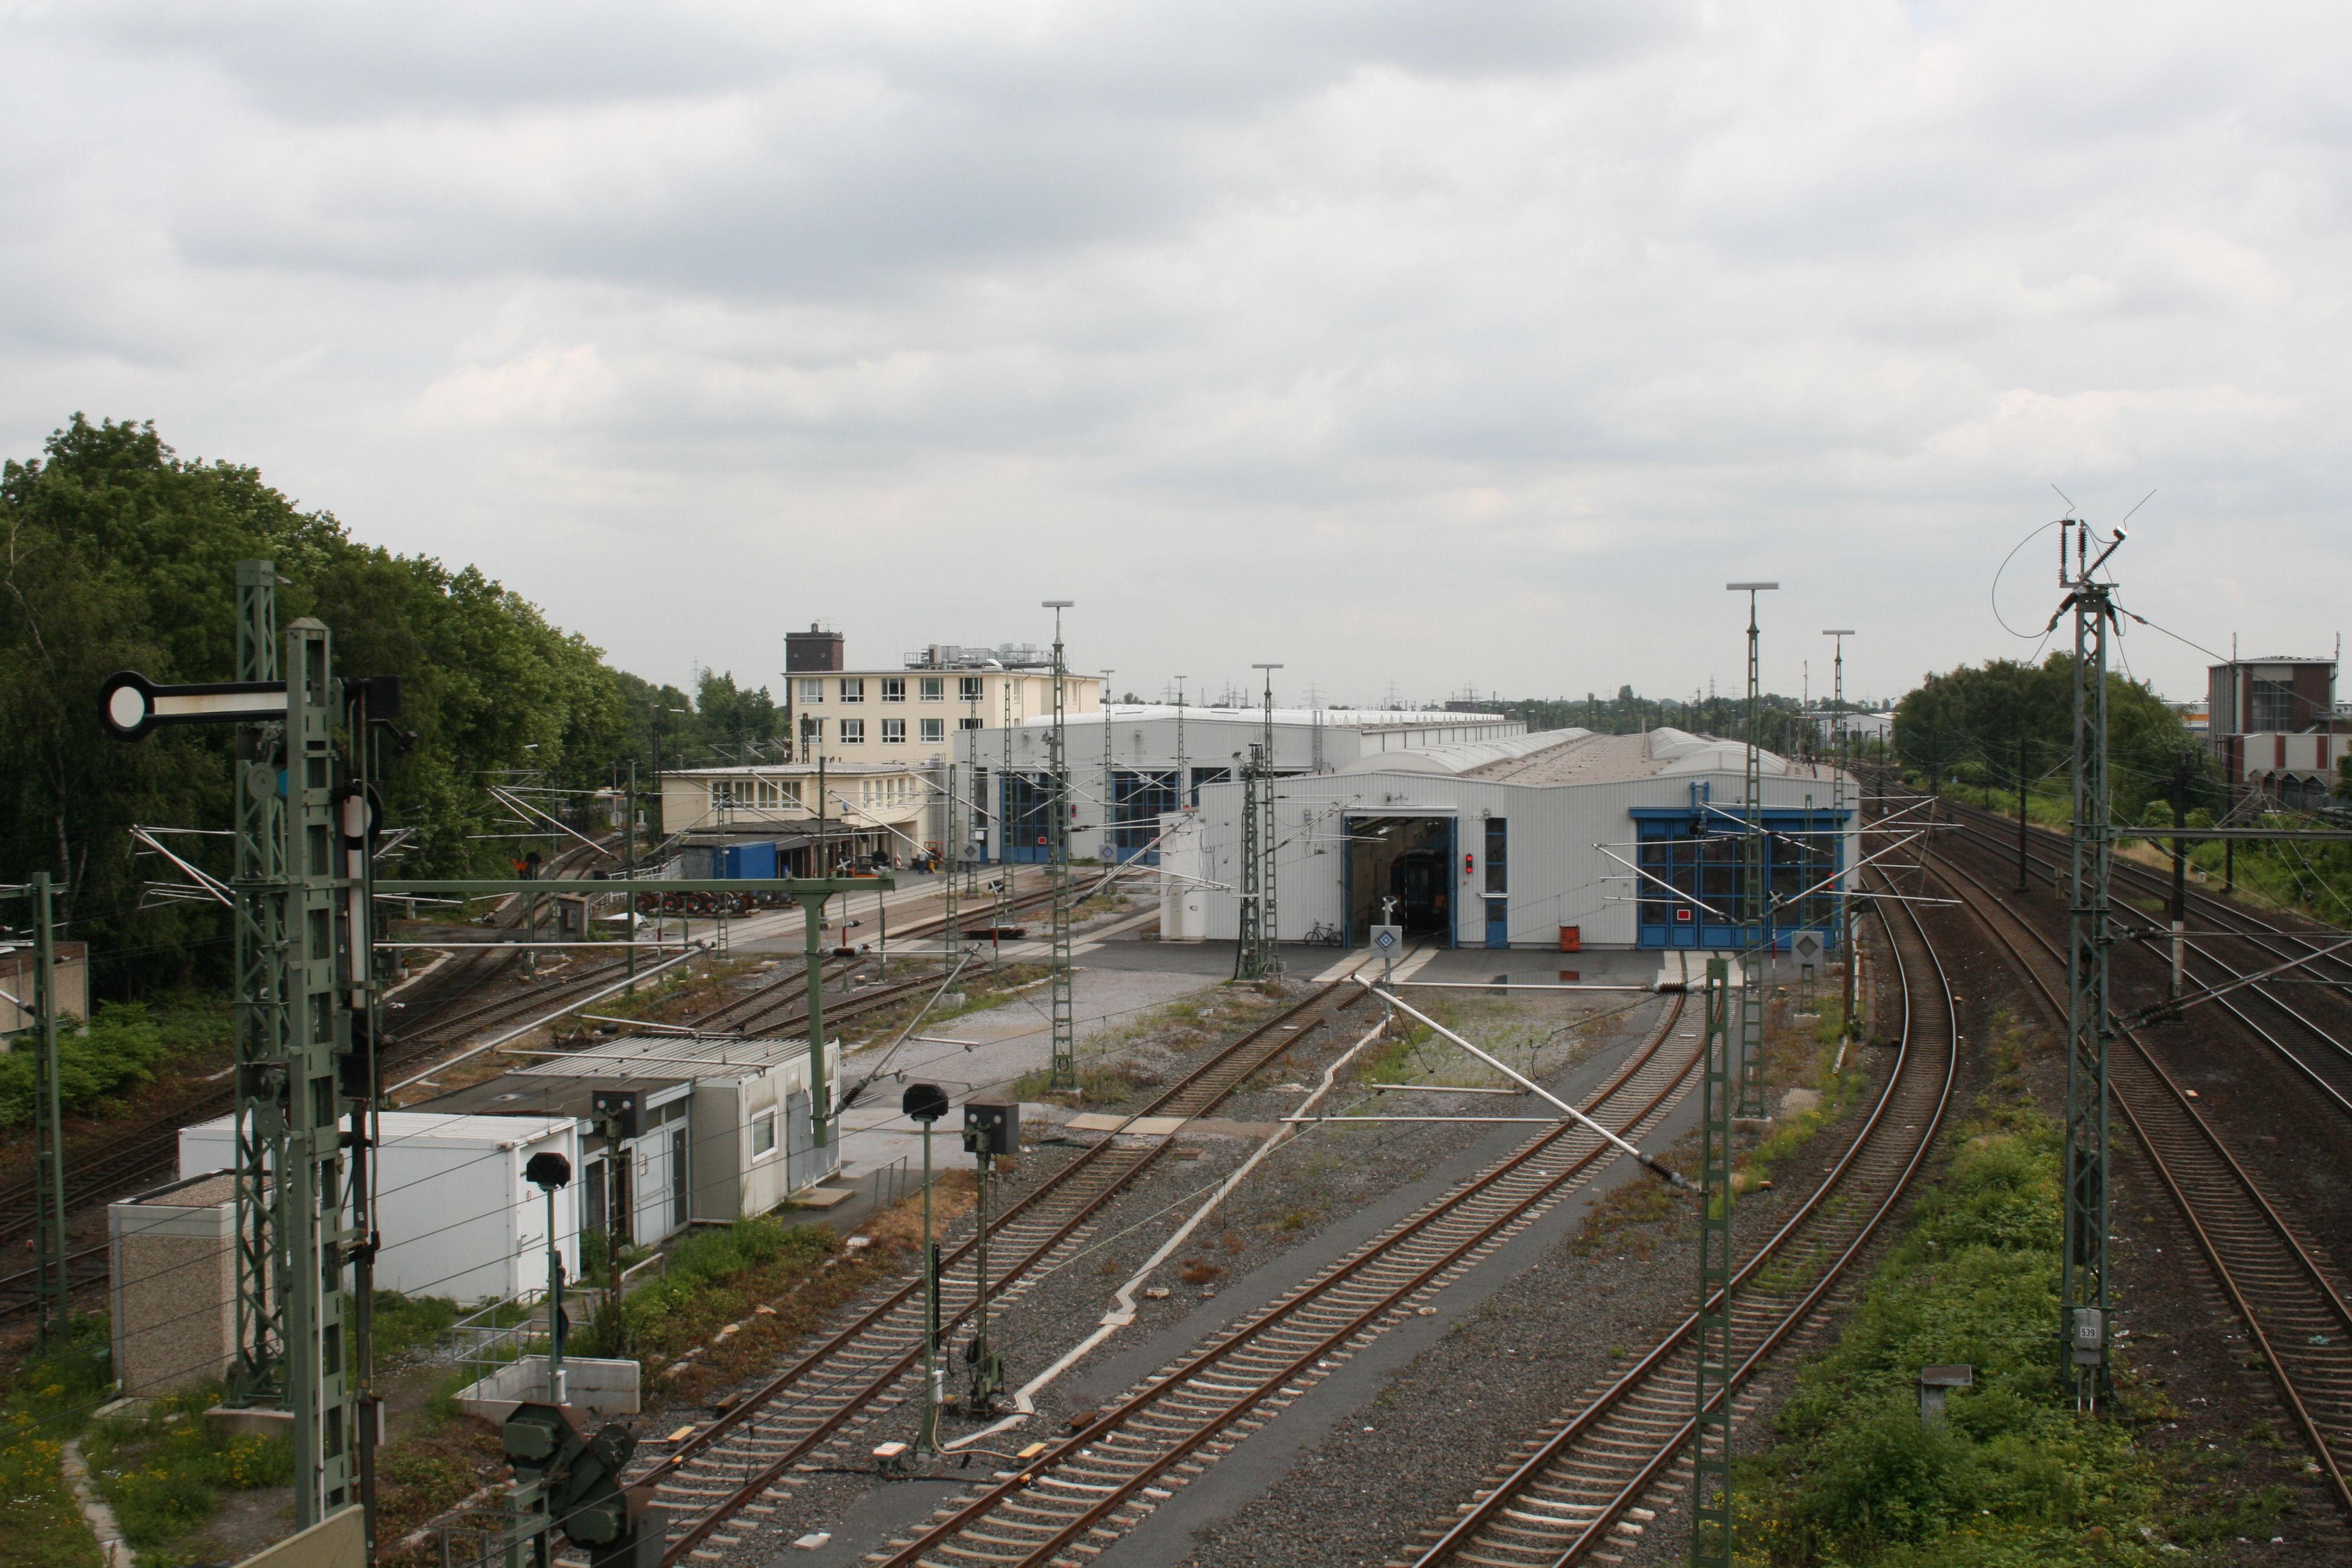 Bahnbetriebswerk dortmund betriebsbahnhof for Depot kamen